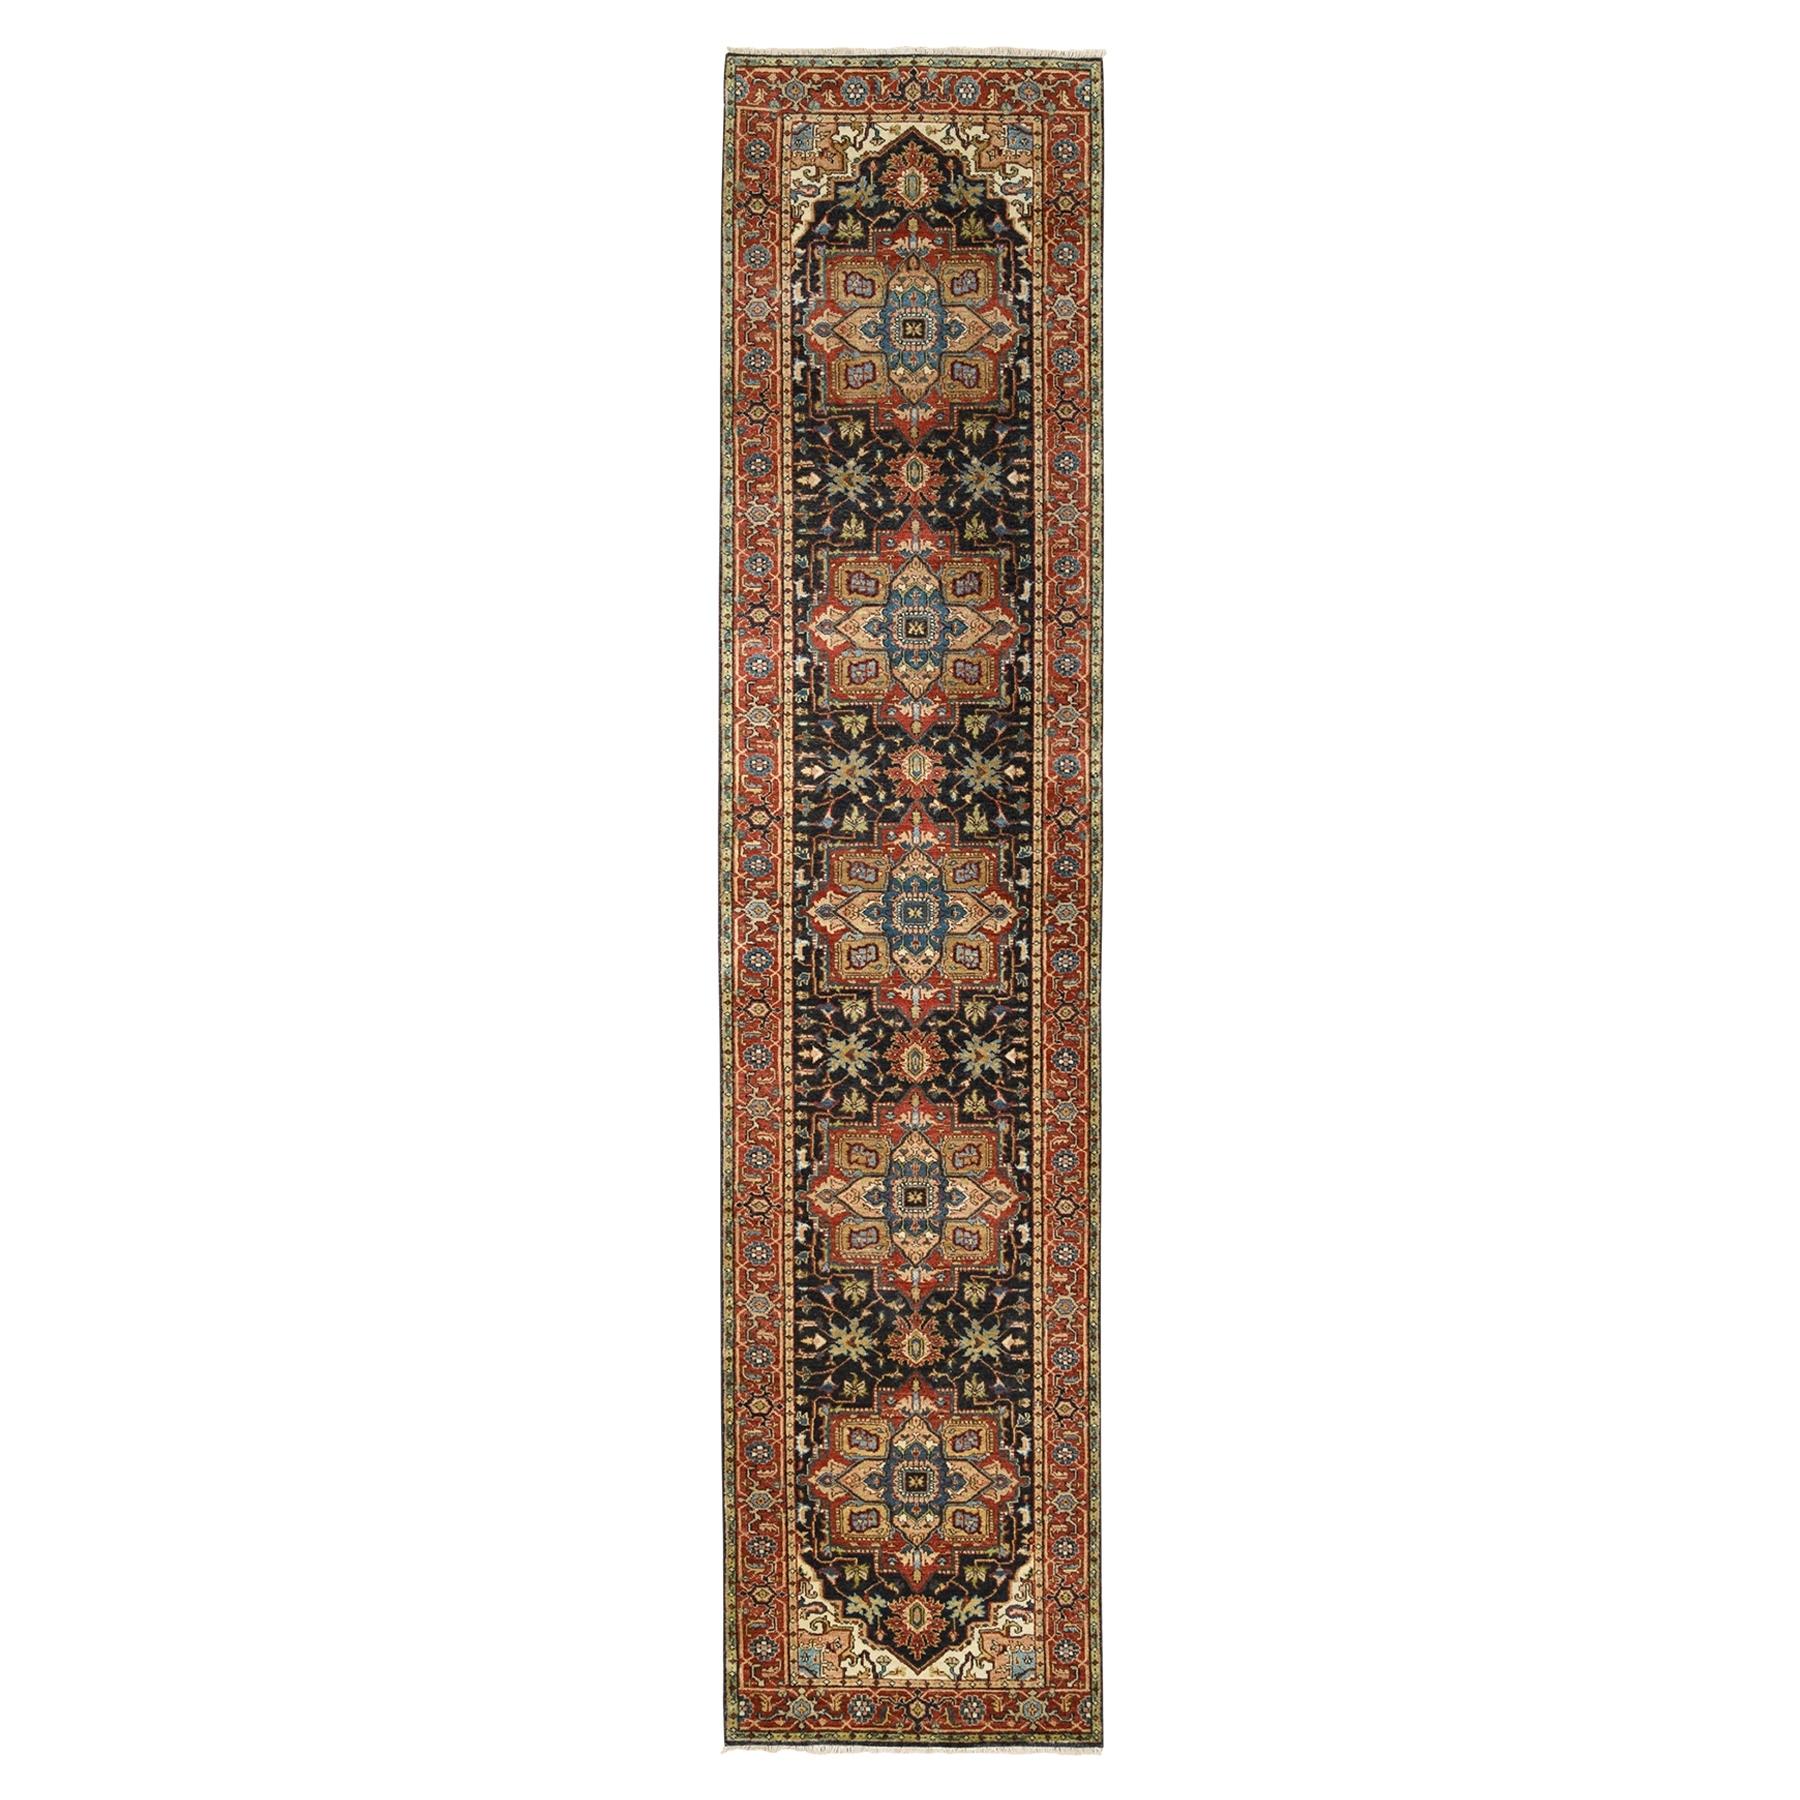 Serapi Heriz and Bakhshayesh Collection Hand Knotted Black Rug No: 1125926